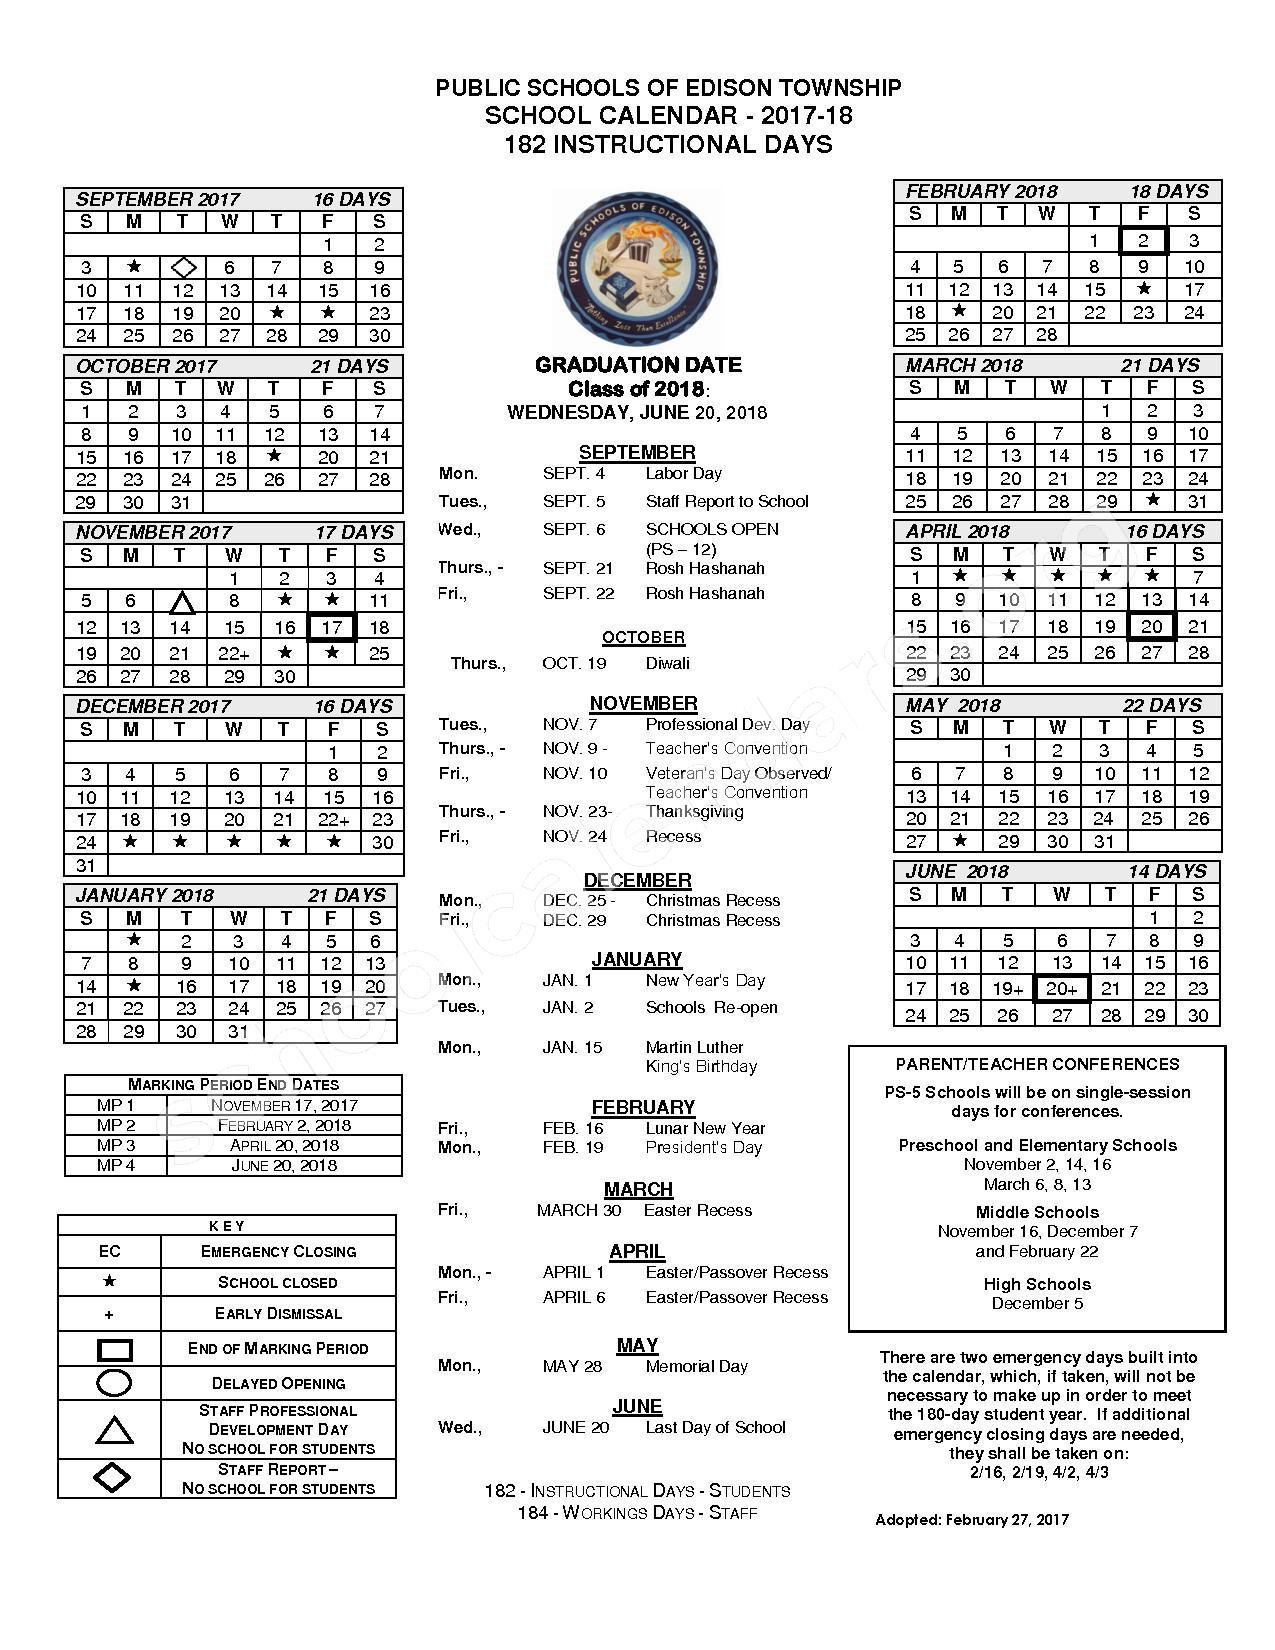 2017 - 2018 School Calendar – Edison Township Public Schools – page 1